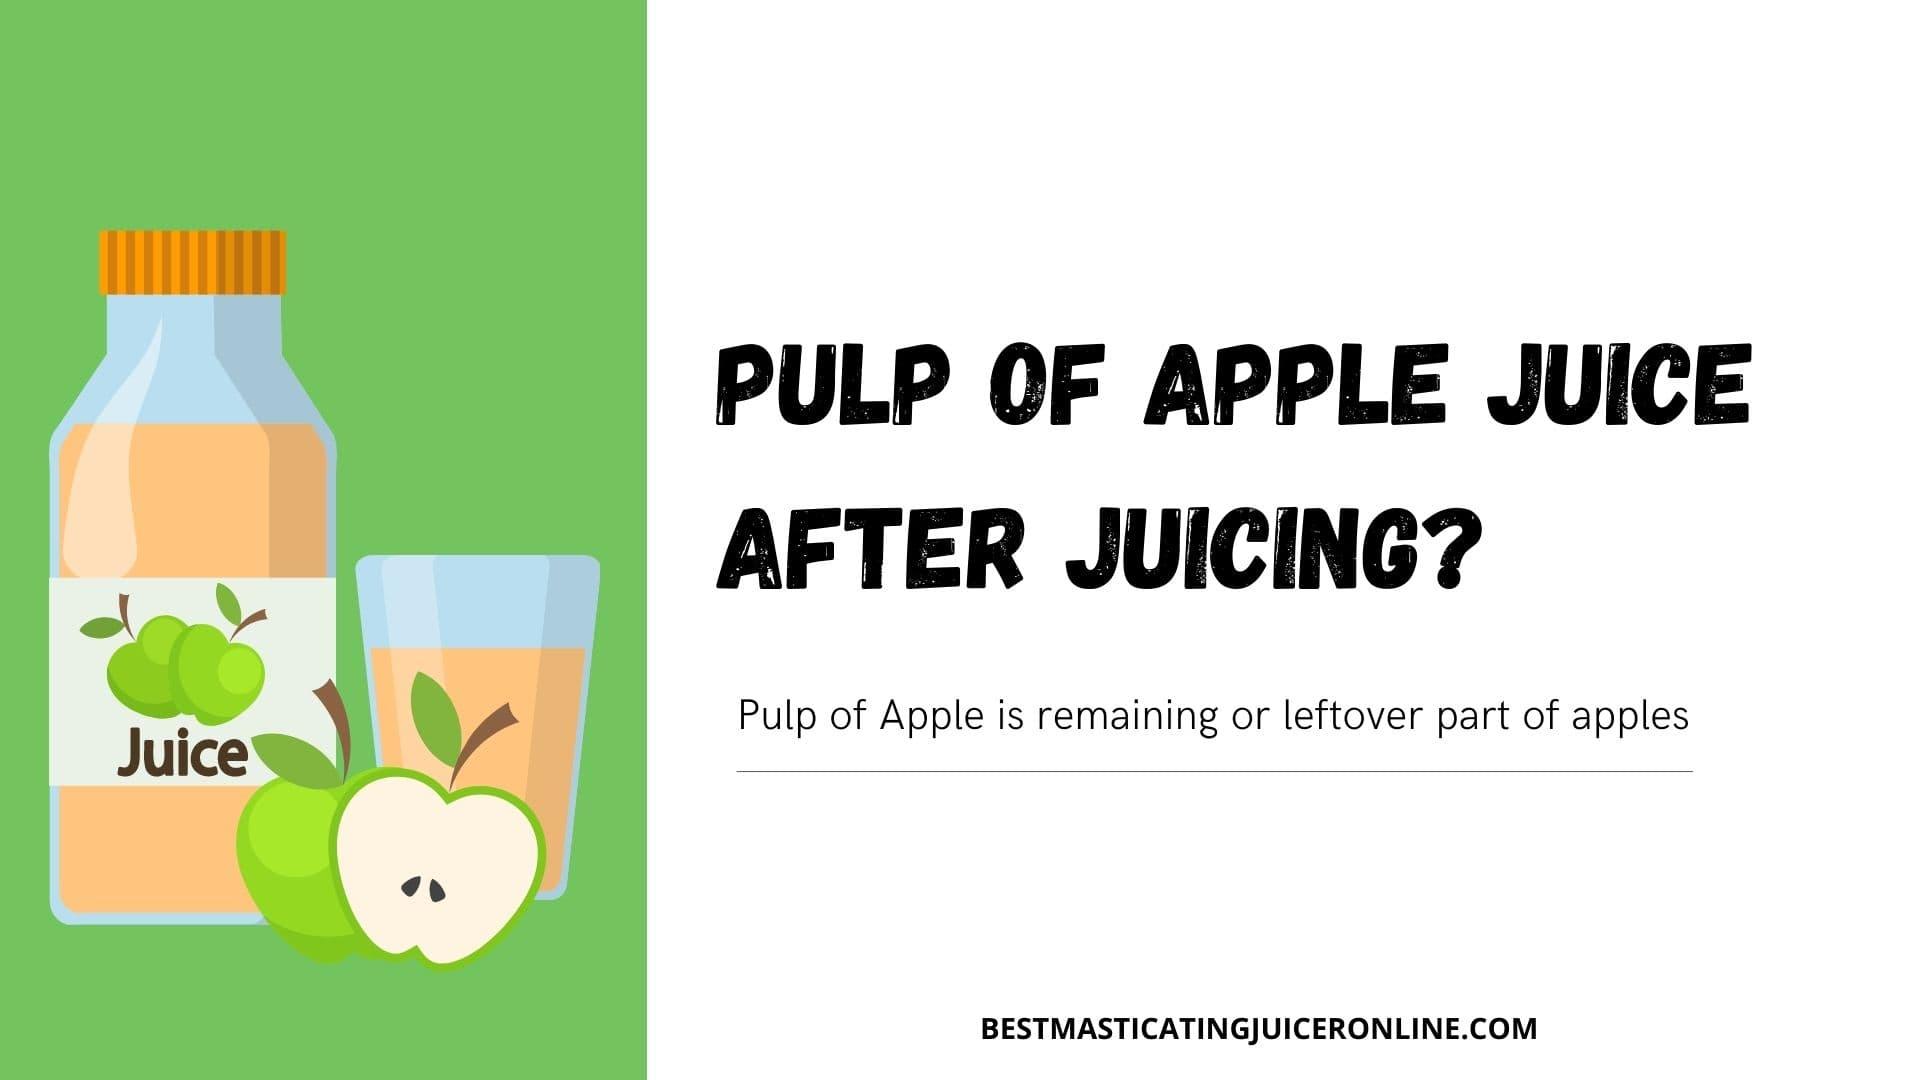 pulp of apple juice after juicing